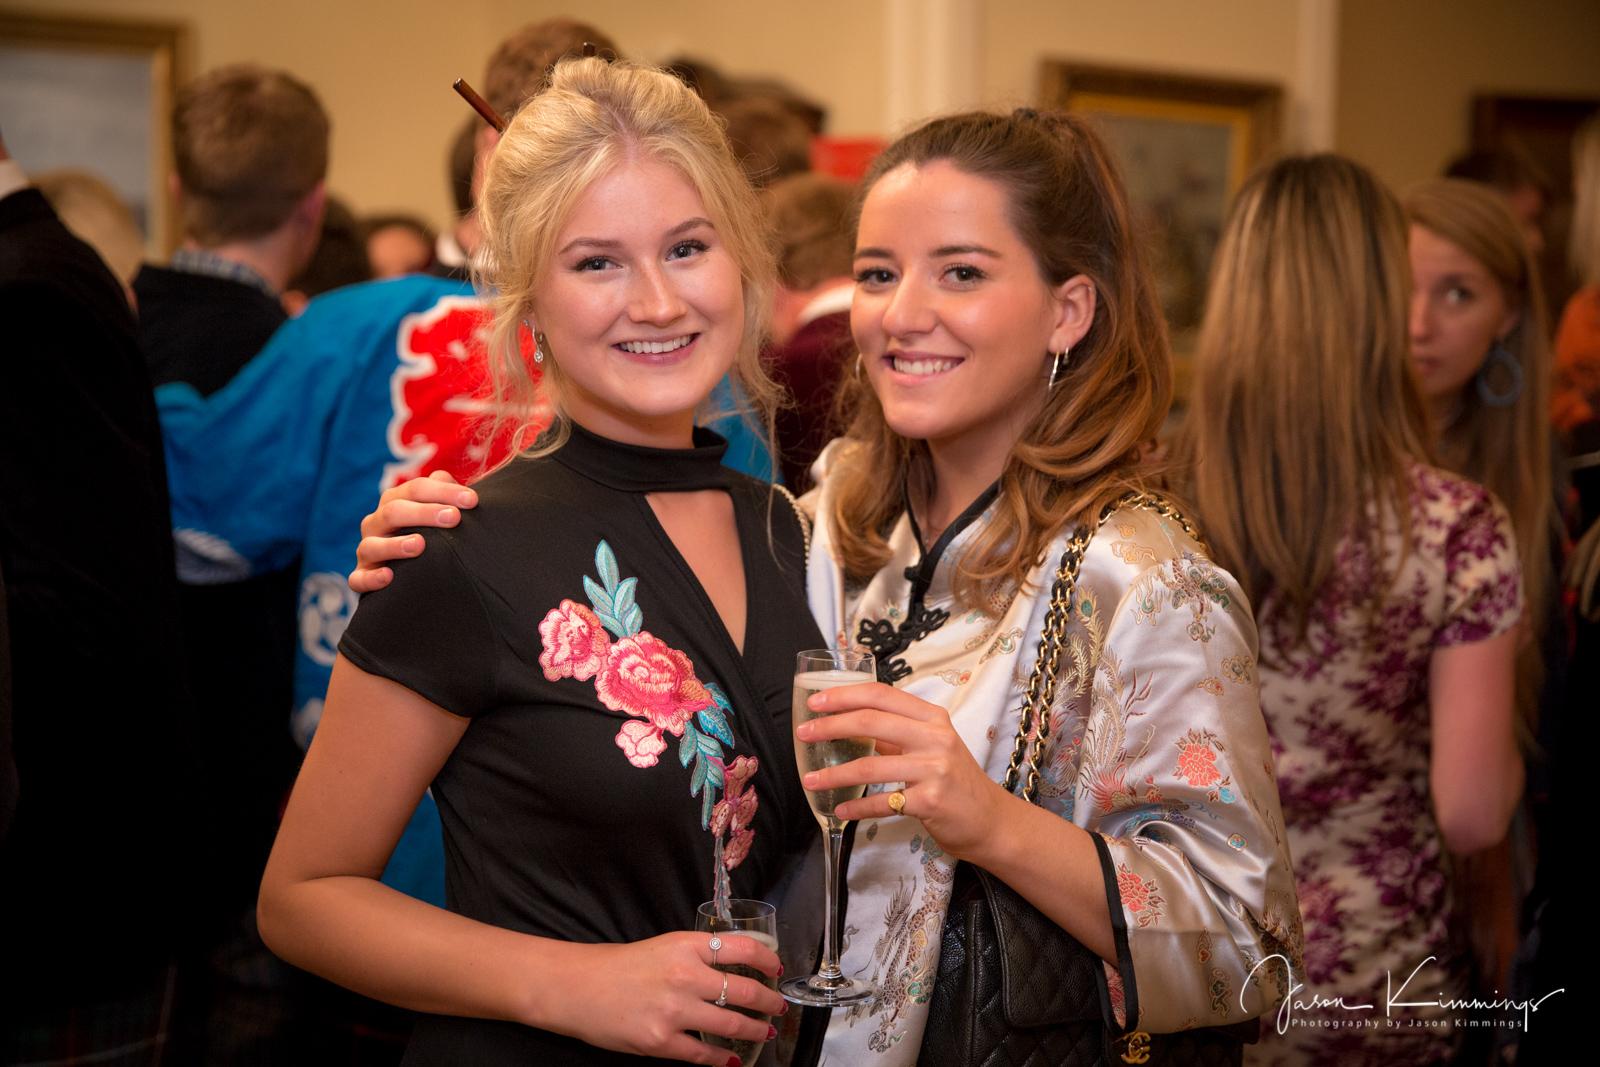 Party-event-photography-west-lothian-edinburgh-glasgow-9.jpg